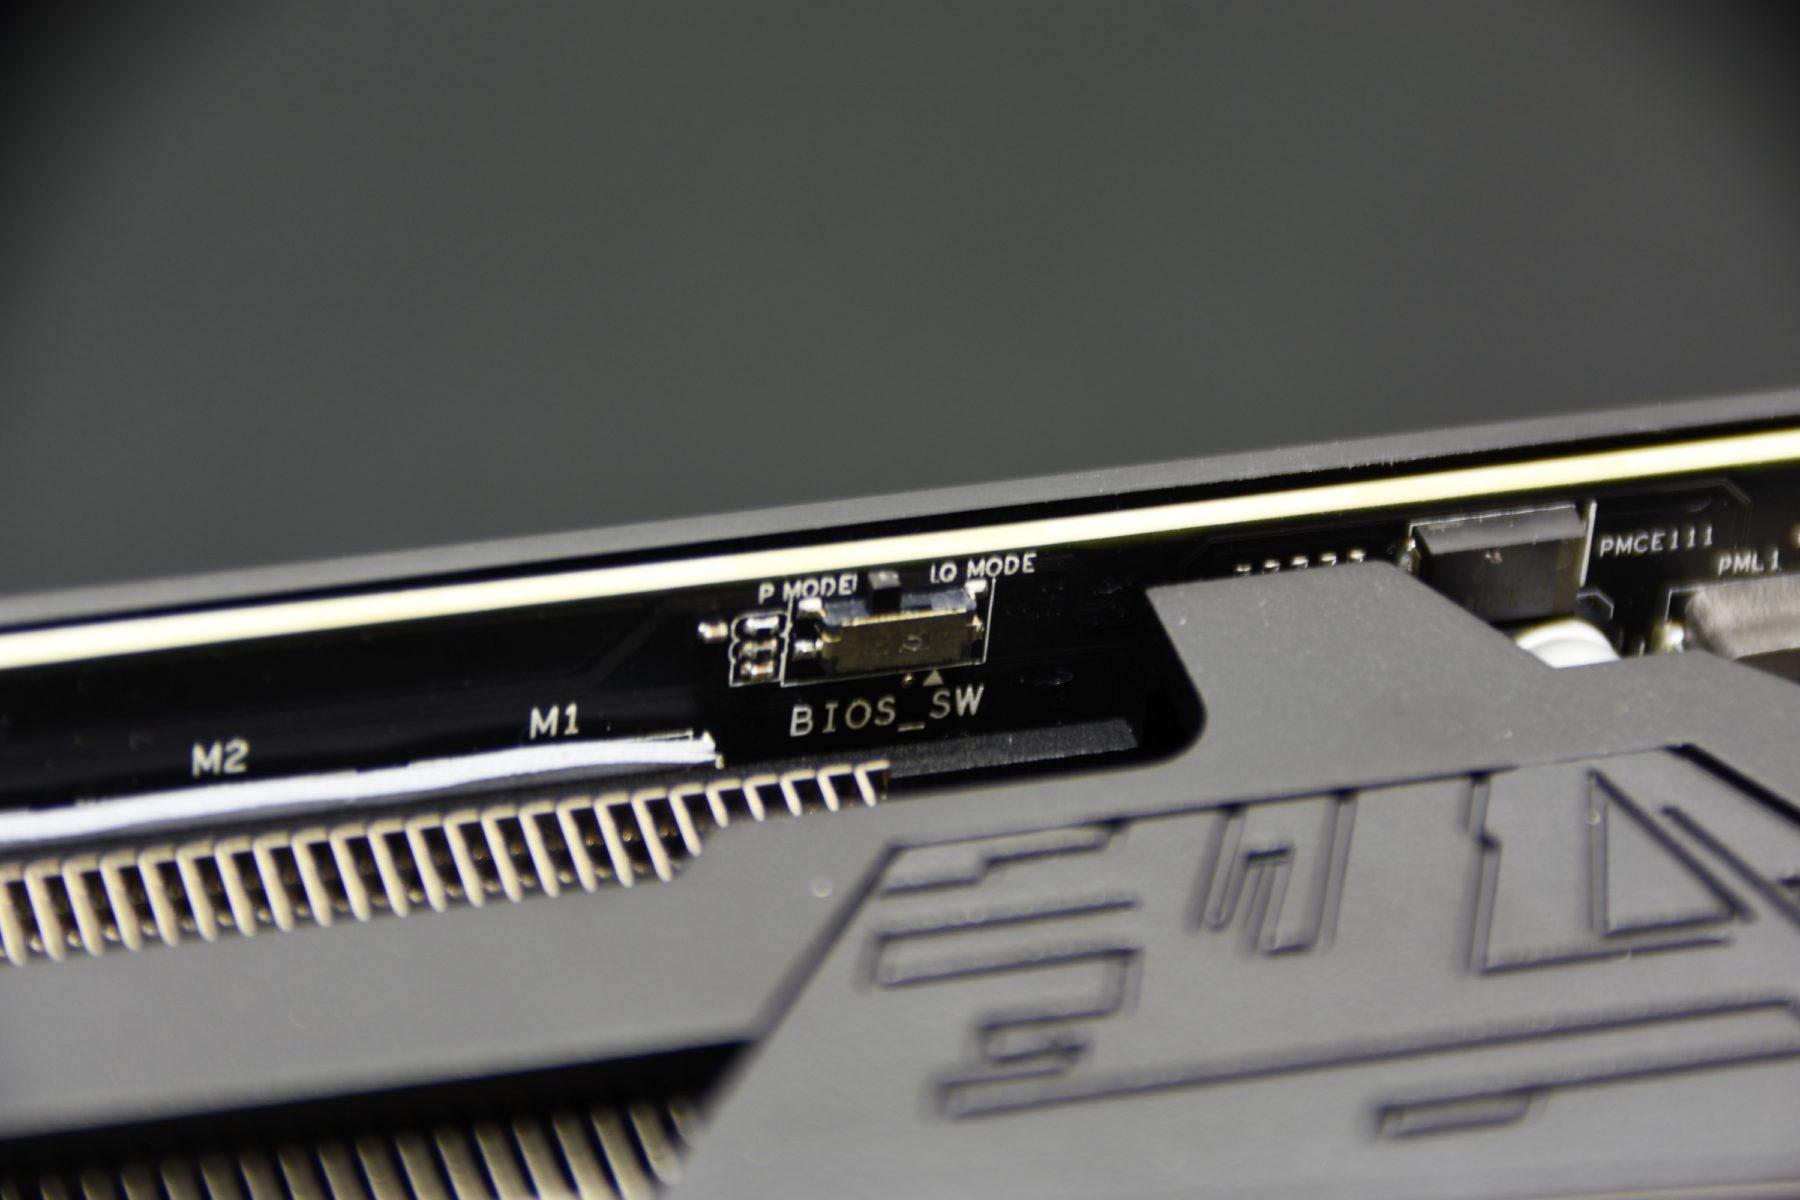 Review ASUS STRIX RTX 2080 Ti OC 11GB GAMING